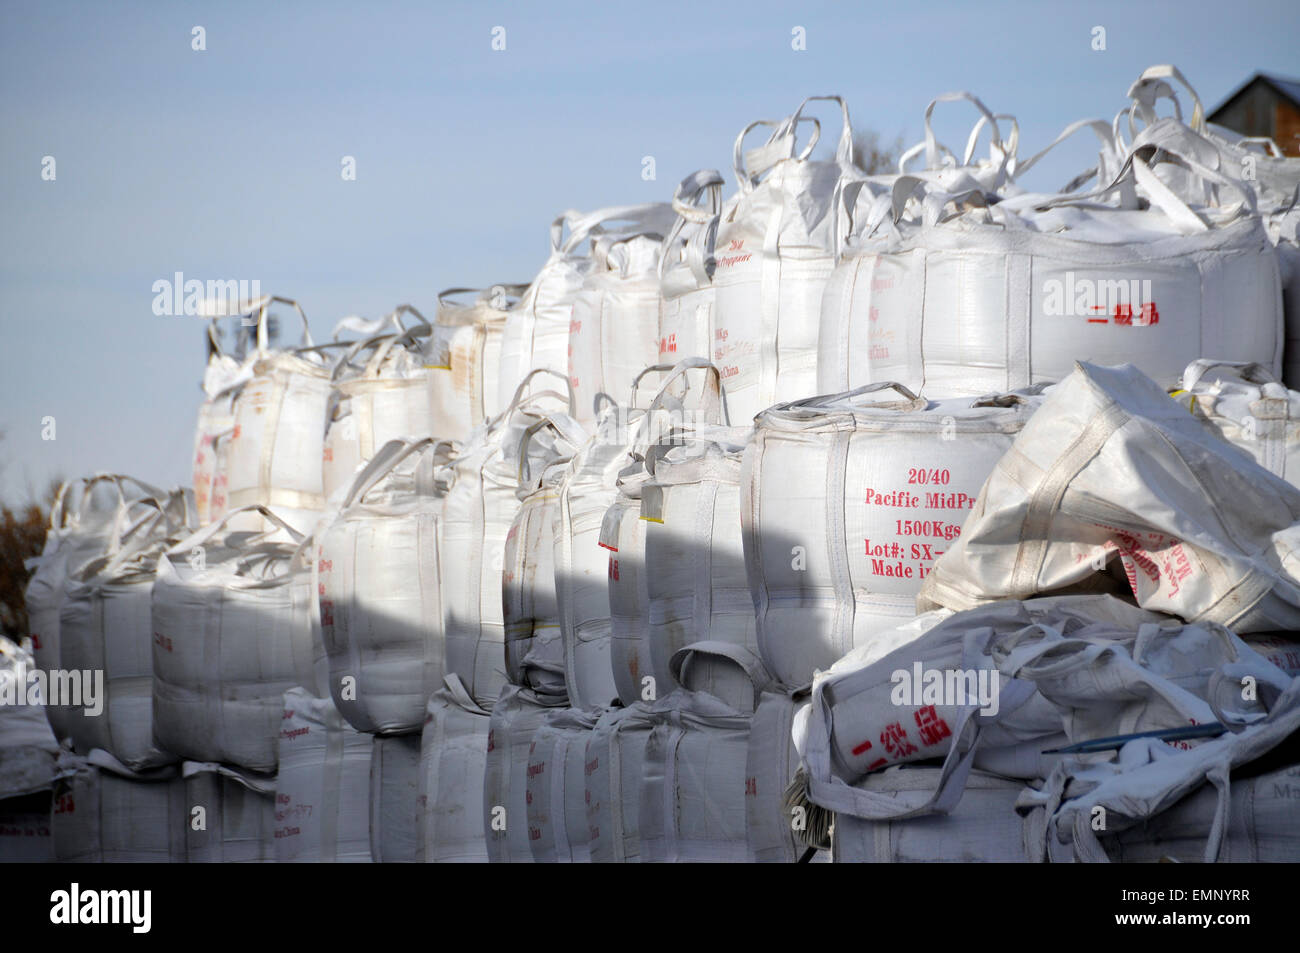 Bags of ceramic proppant for use in hydrolic fracking, Williston, North Dakota. - Stock Image